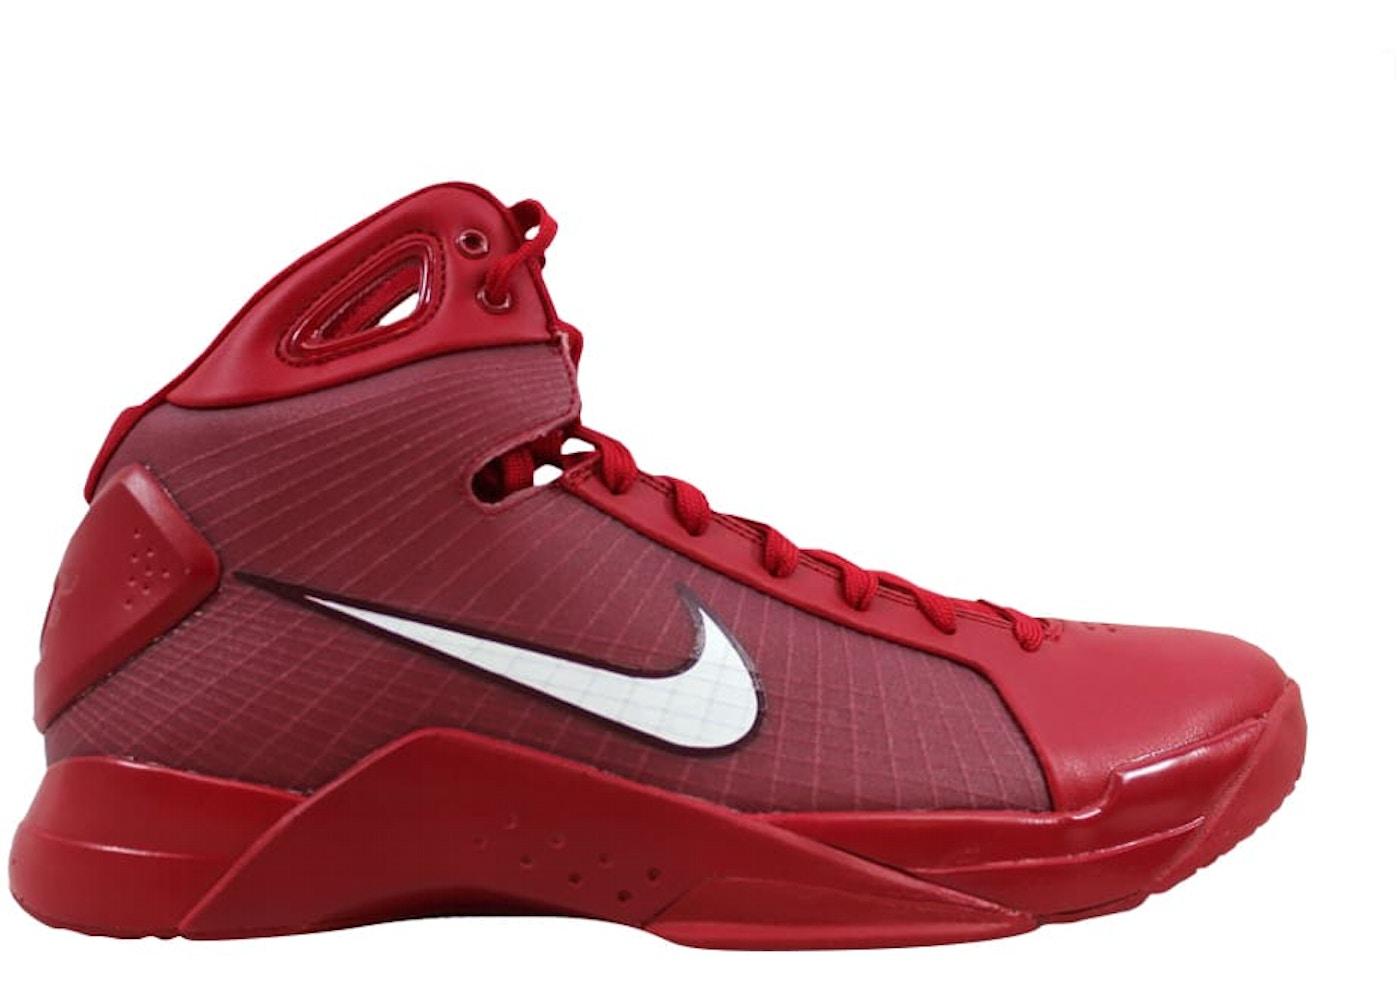 e32a8668 Nike Hyperdunk '08 Gym Red/White-Team Red - 820321-601